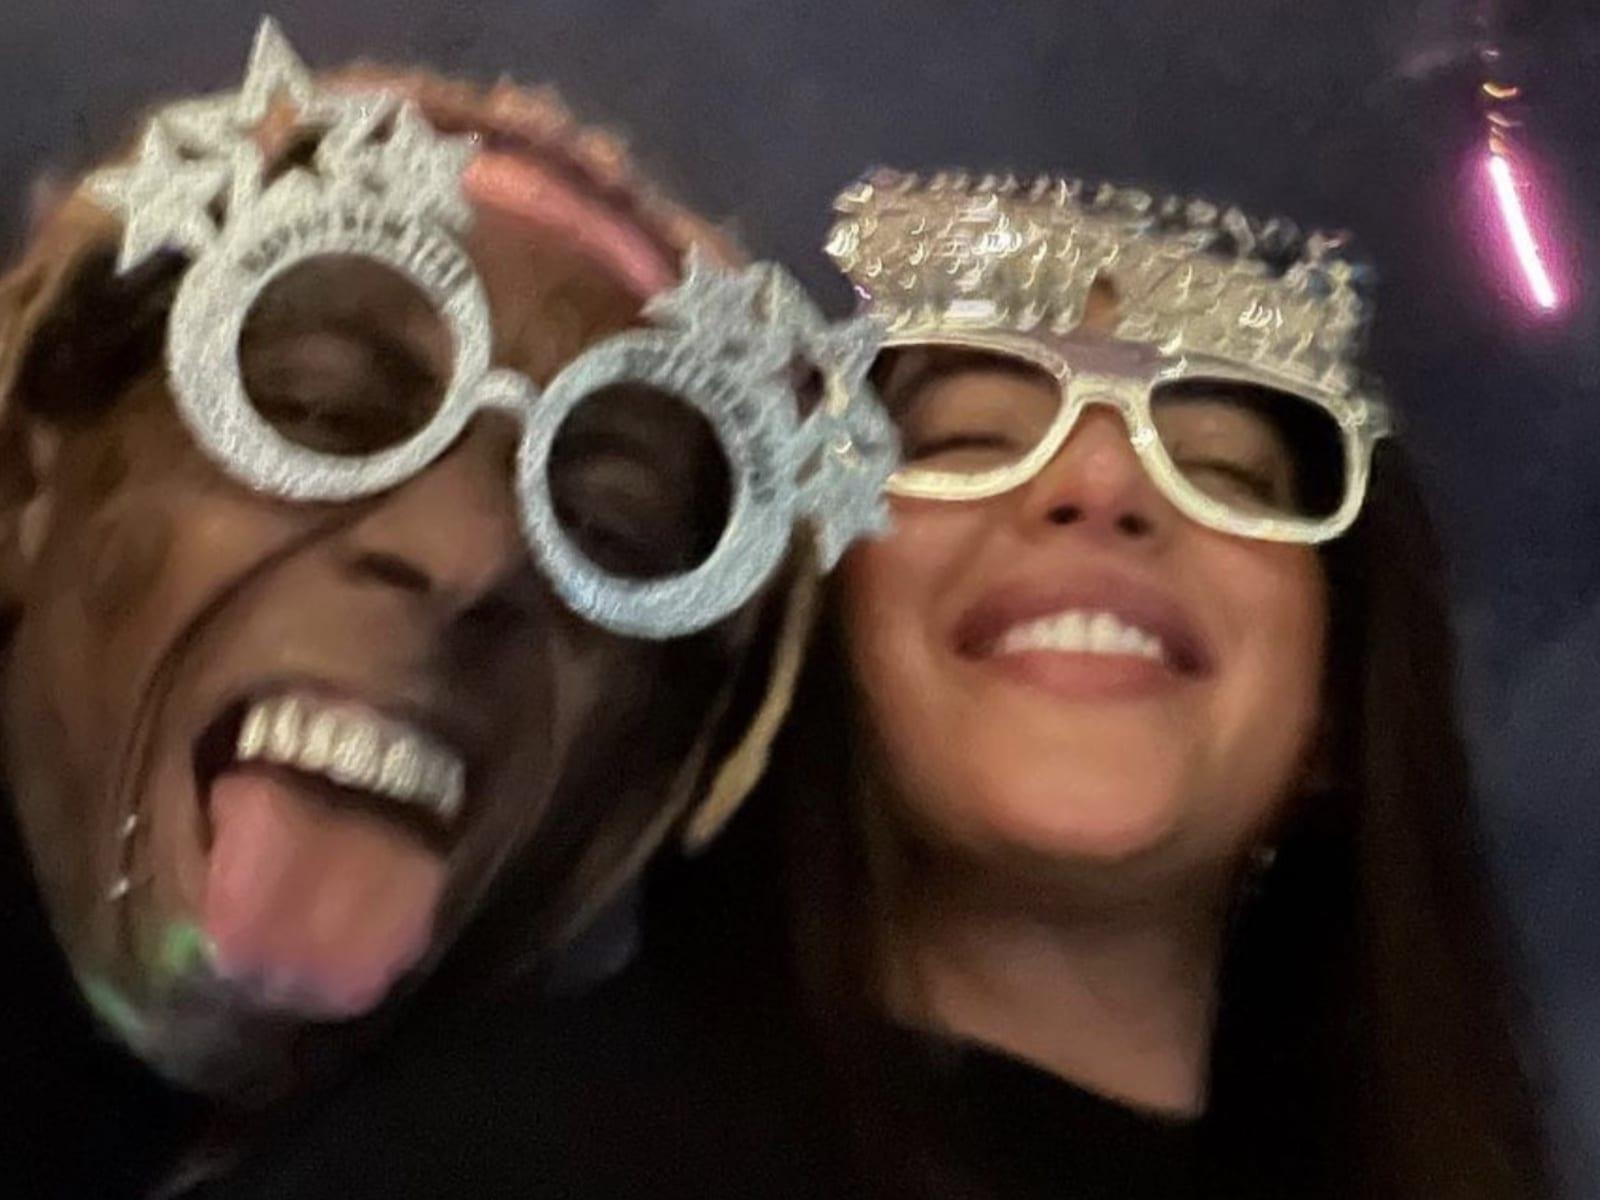 Lil Wayne Denise Bidot New Year's Moment